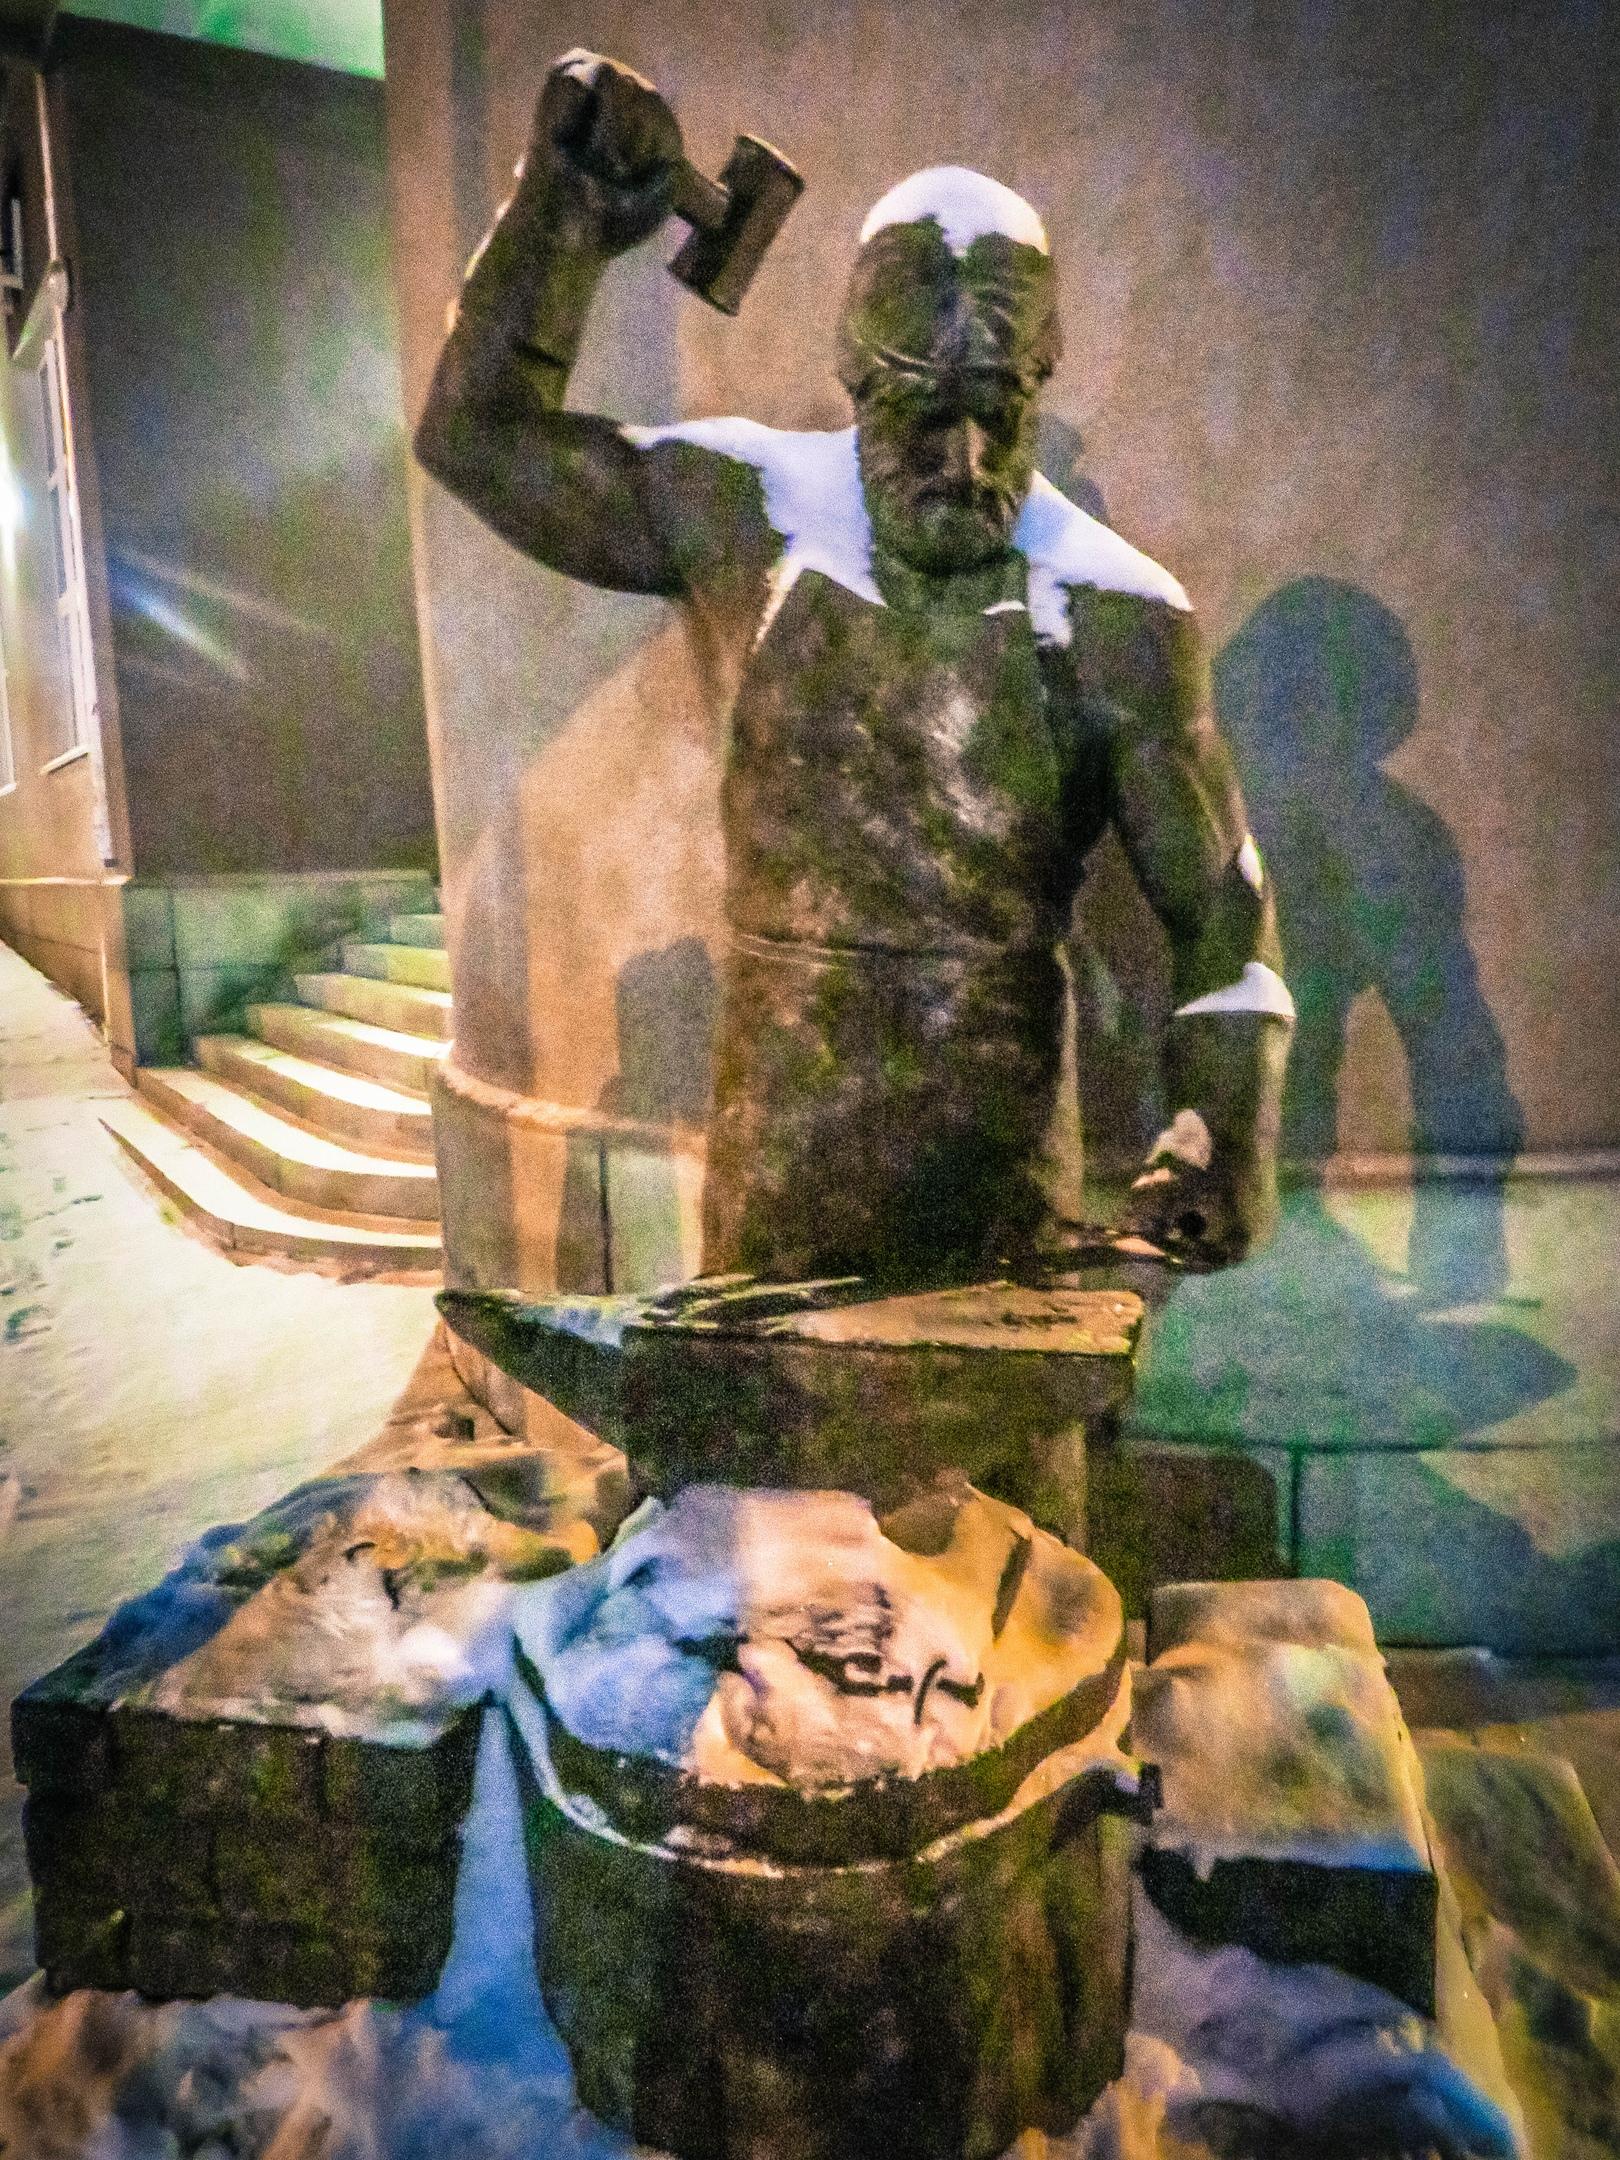 Памятник кузнецу. Фото Игоря Полянина.